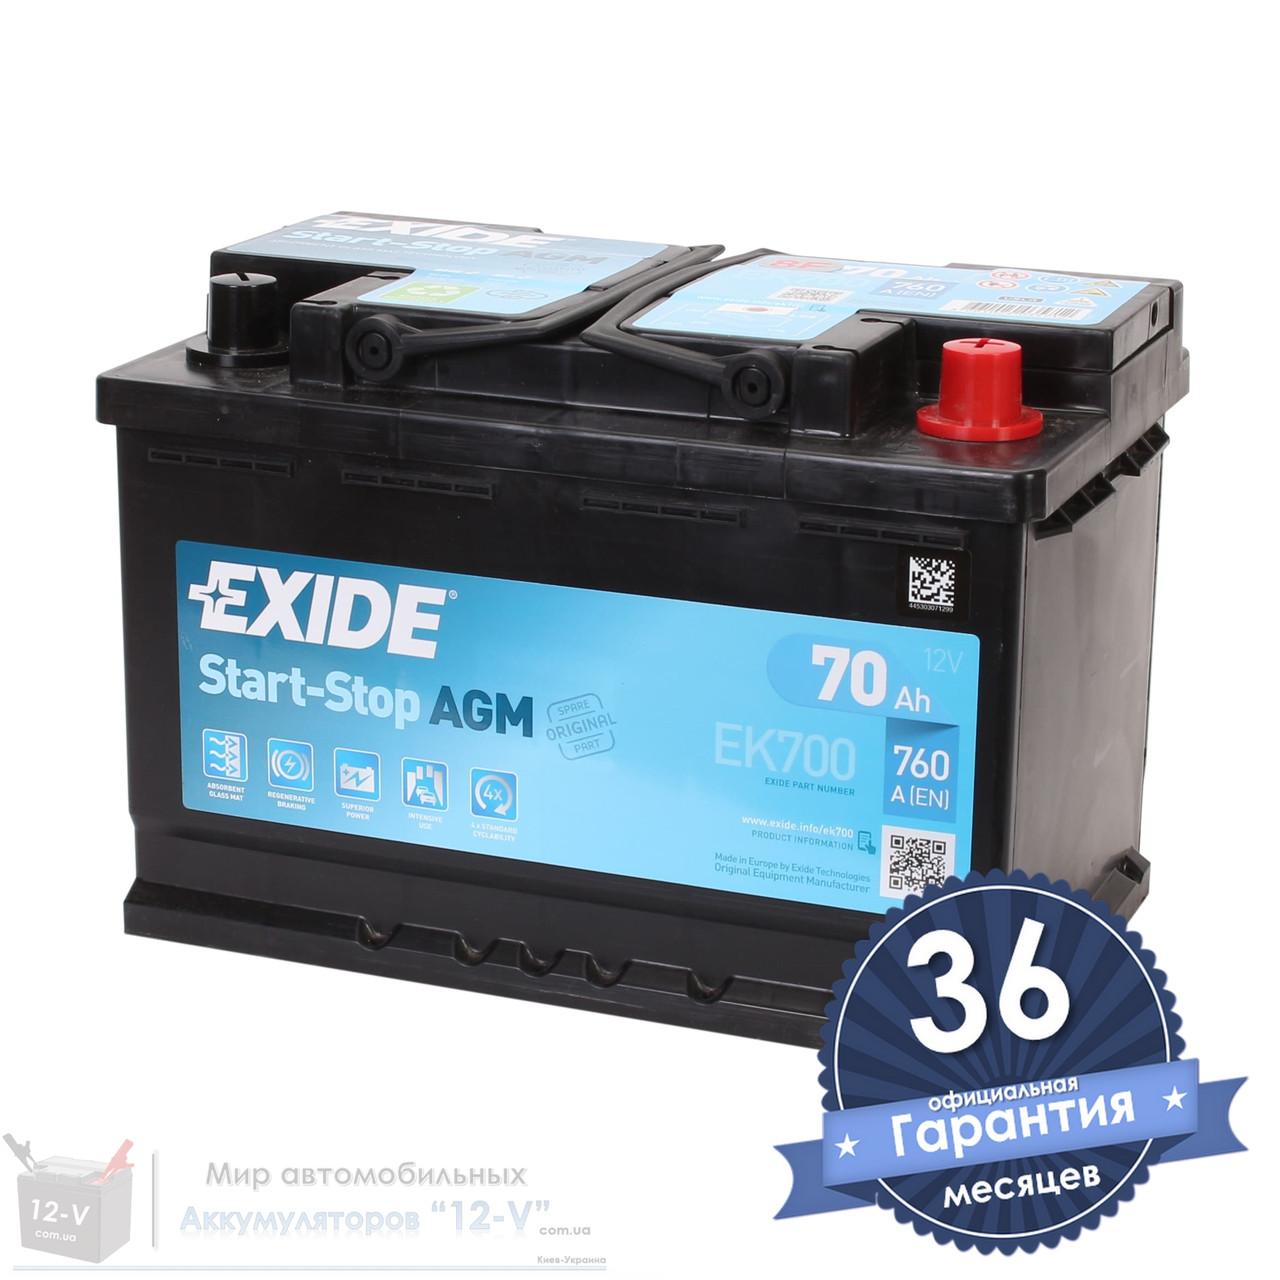 Аккумулятор автомобильный EXIDE AGM 6CT 70Ah, пусковой ток 760А [– +] (EK700)